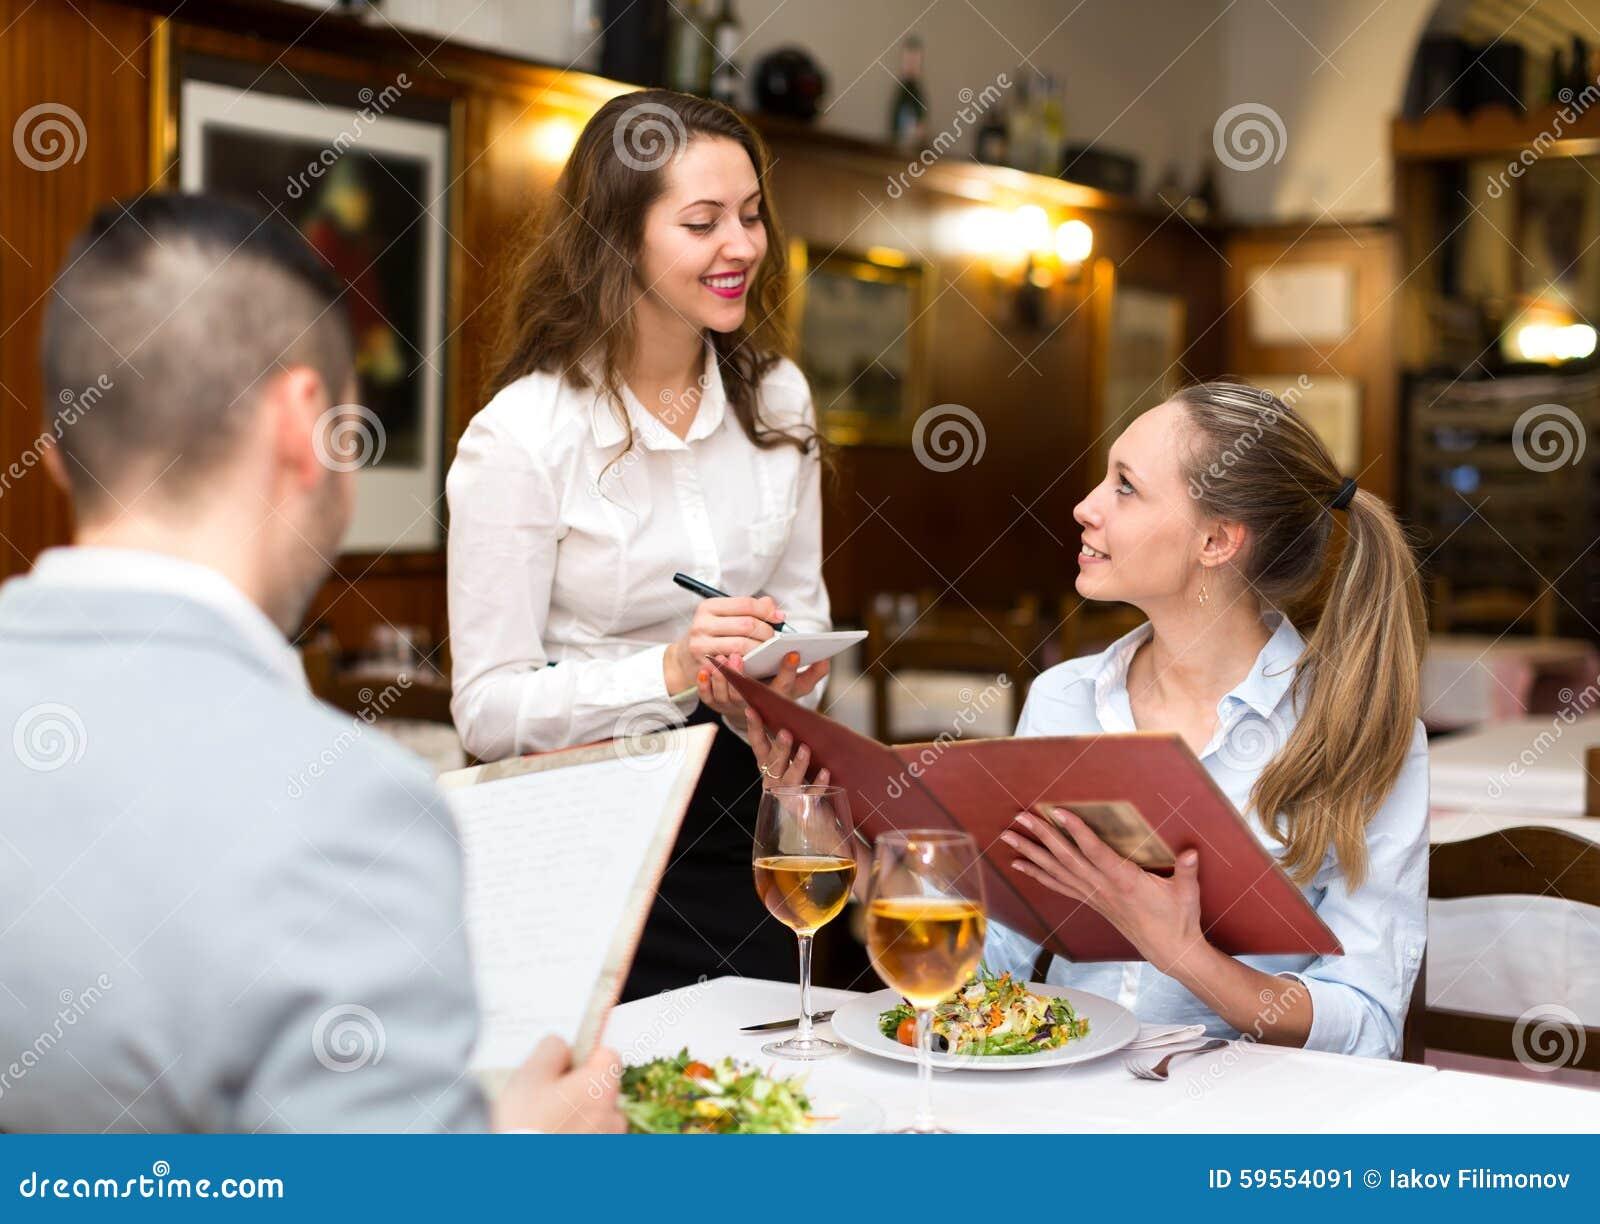 Fine Dining Waitress Hair Styles fine dining server  : hospitable waitress taking order couple rural restaurant 59554091 from hnczcyw.com size 1300 x 1011 jpeg 143kB